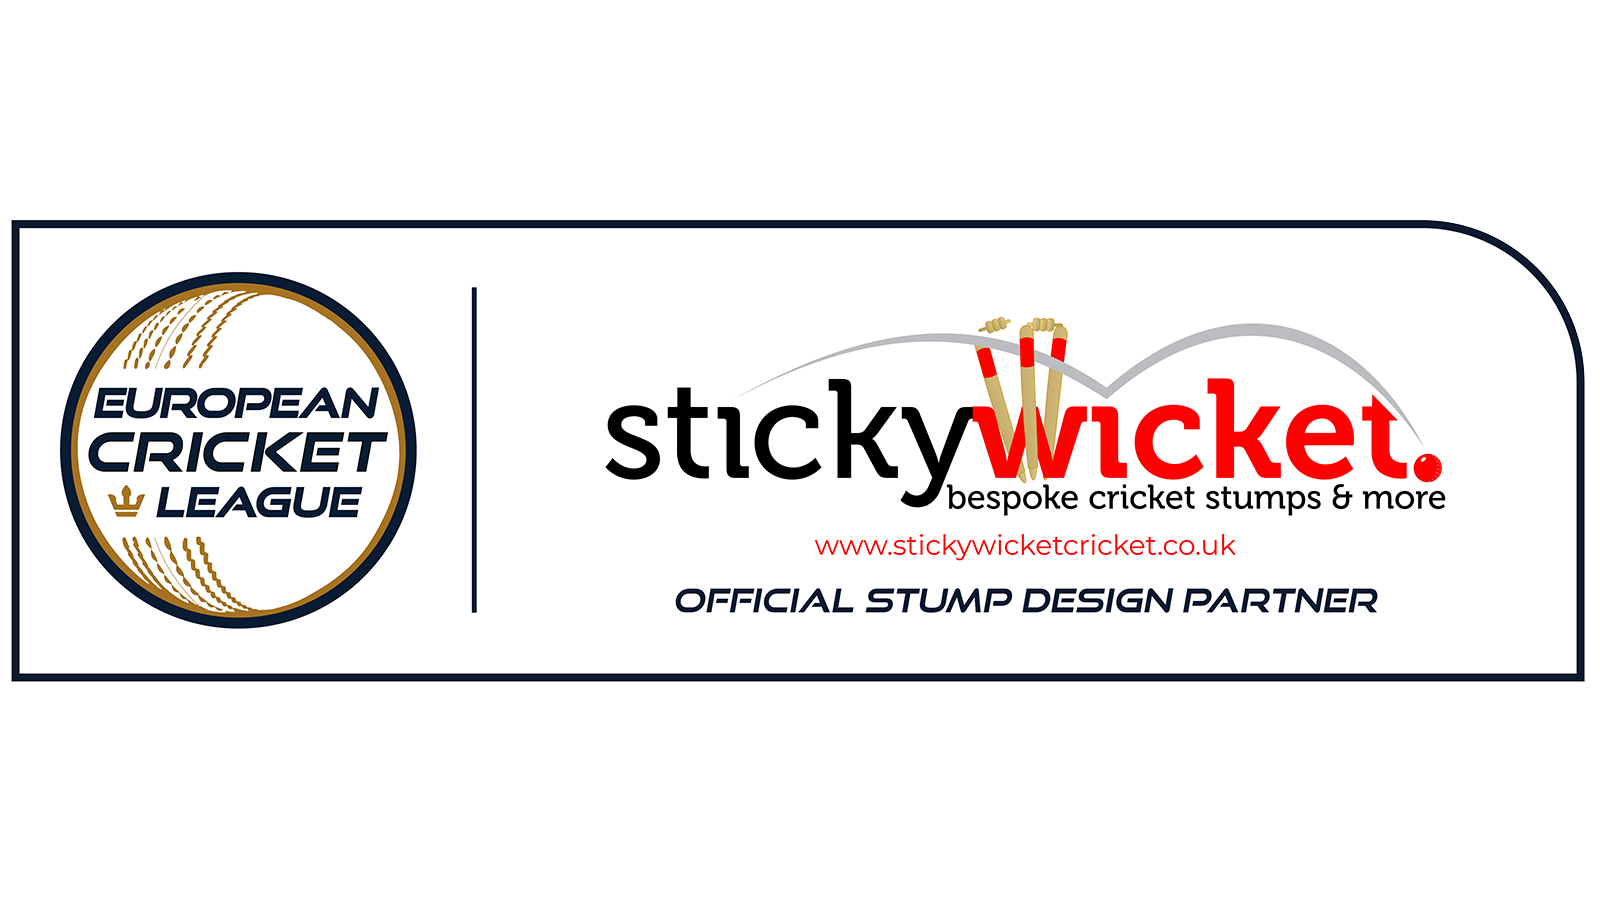 Sticky Wicket_1600x900 copy.png